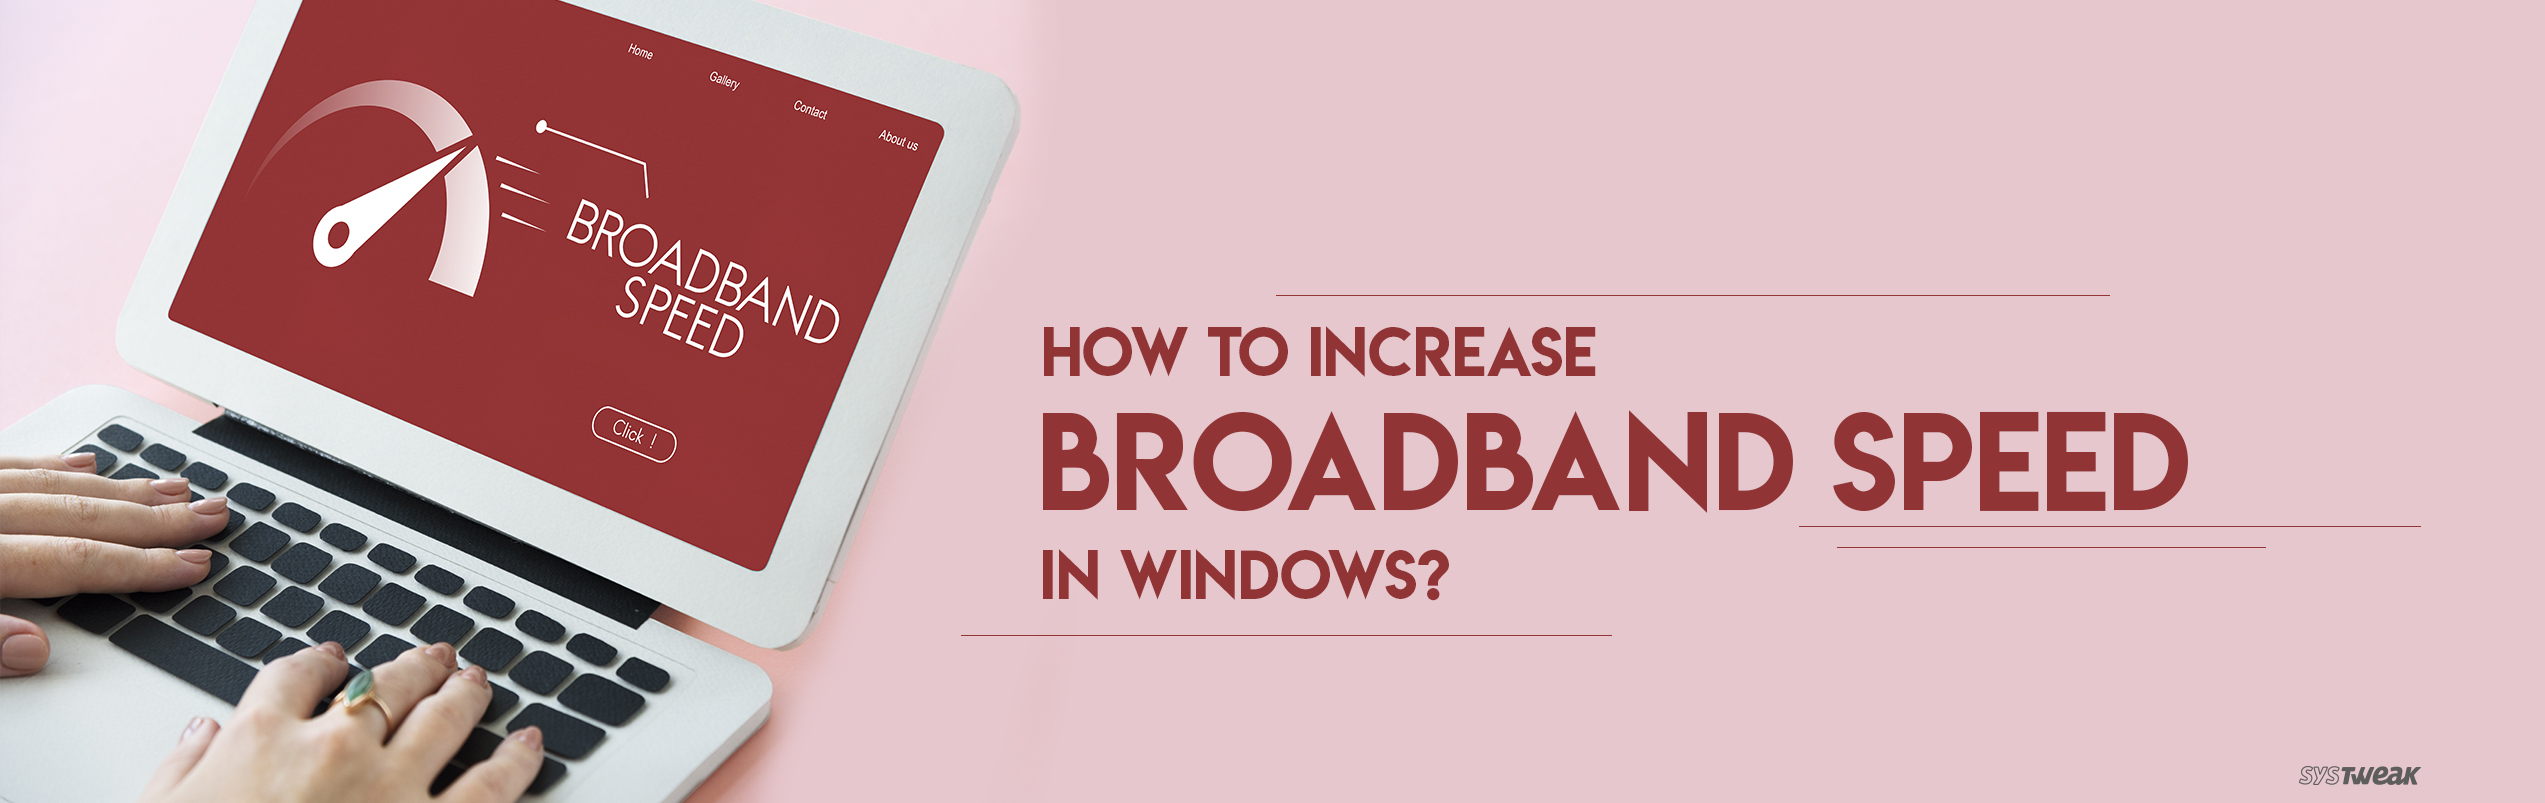 Hacks To Increase Broadband Speed In Windows